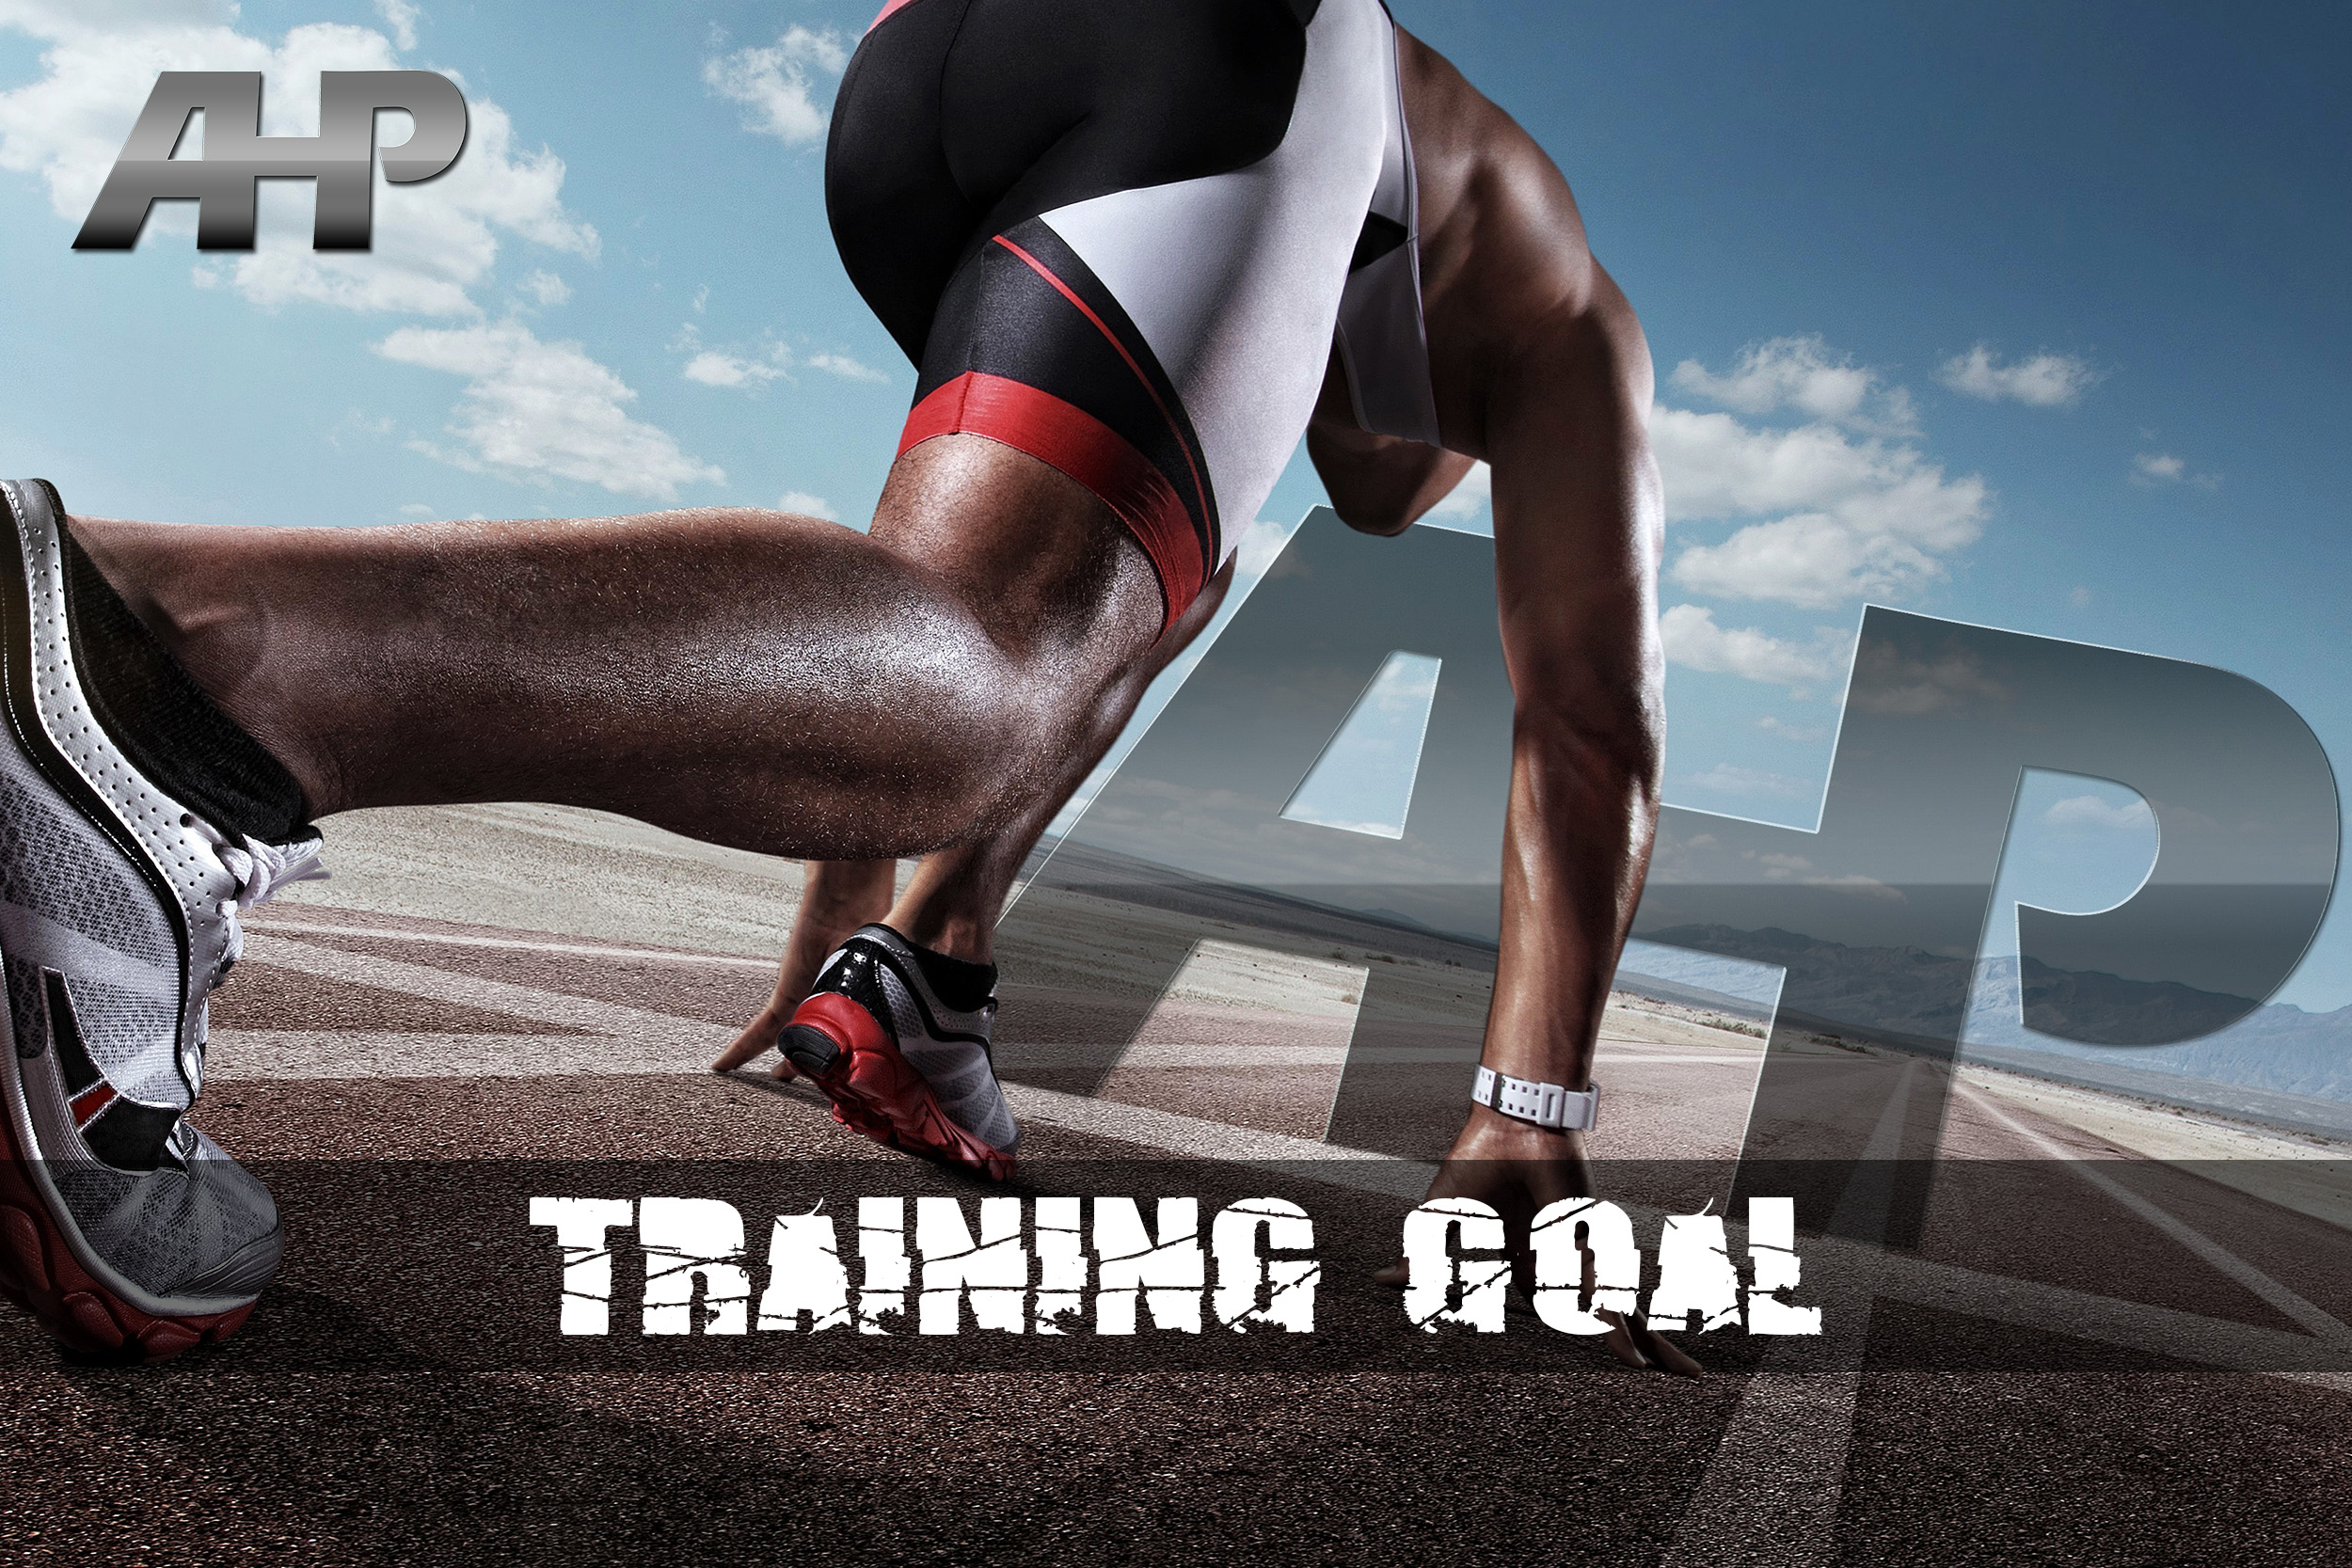 Shop by Training Goal Thumbnail (AHP).jpg